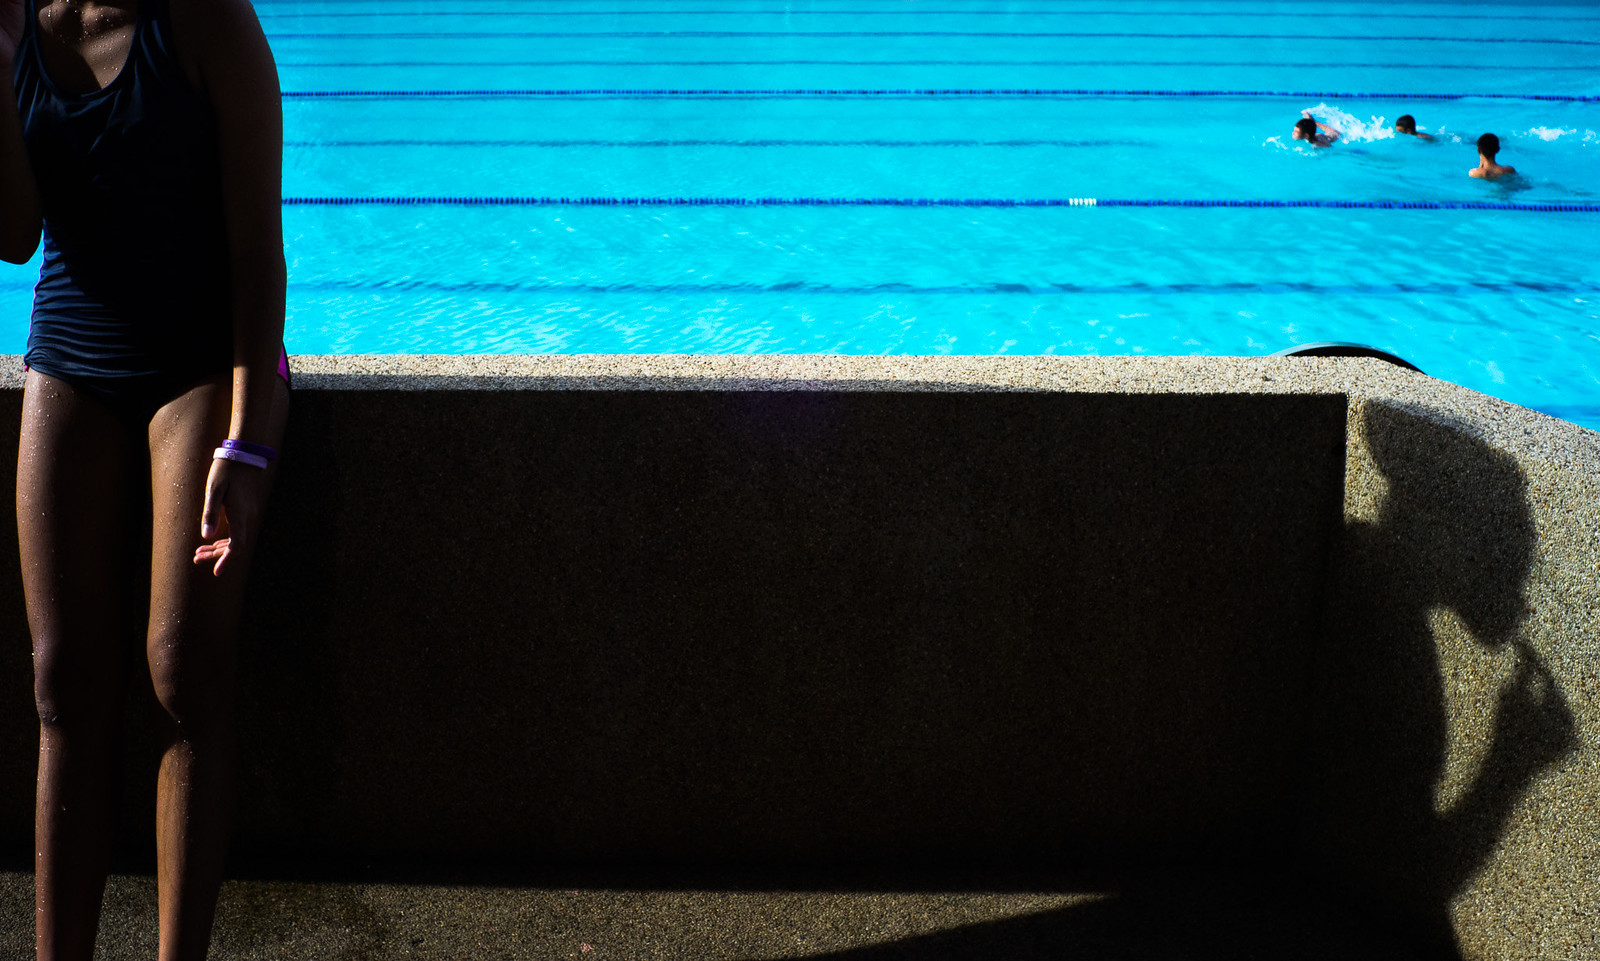 Swimming pool. | by noppadol.maitreechit